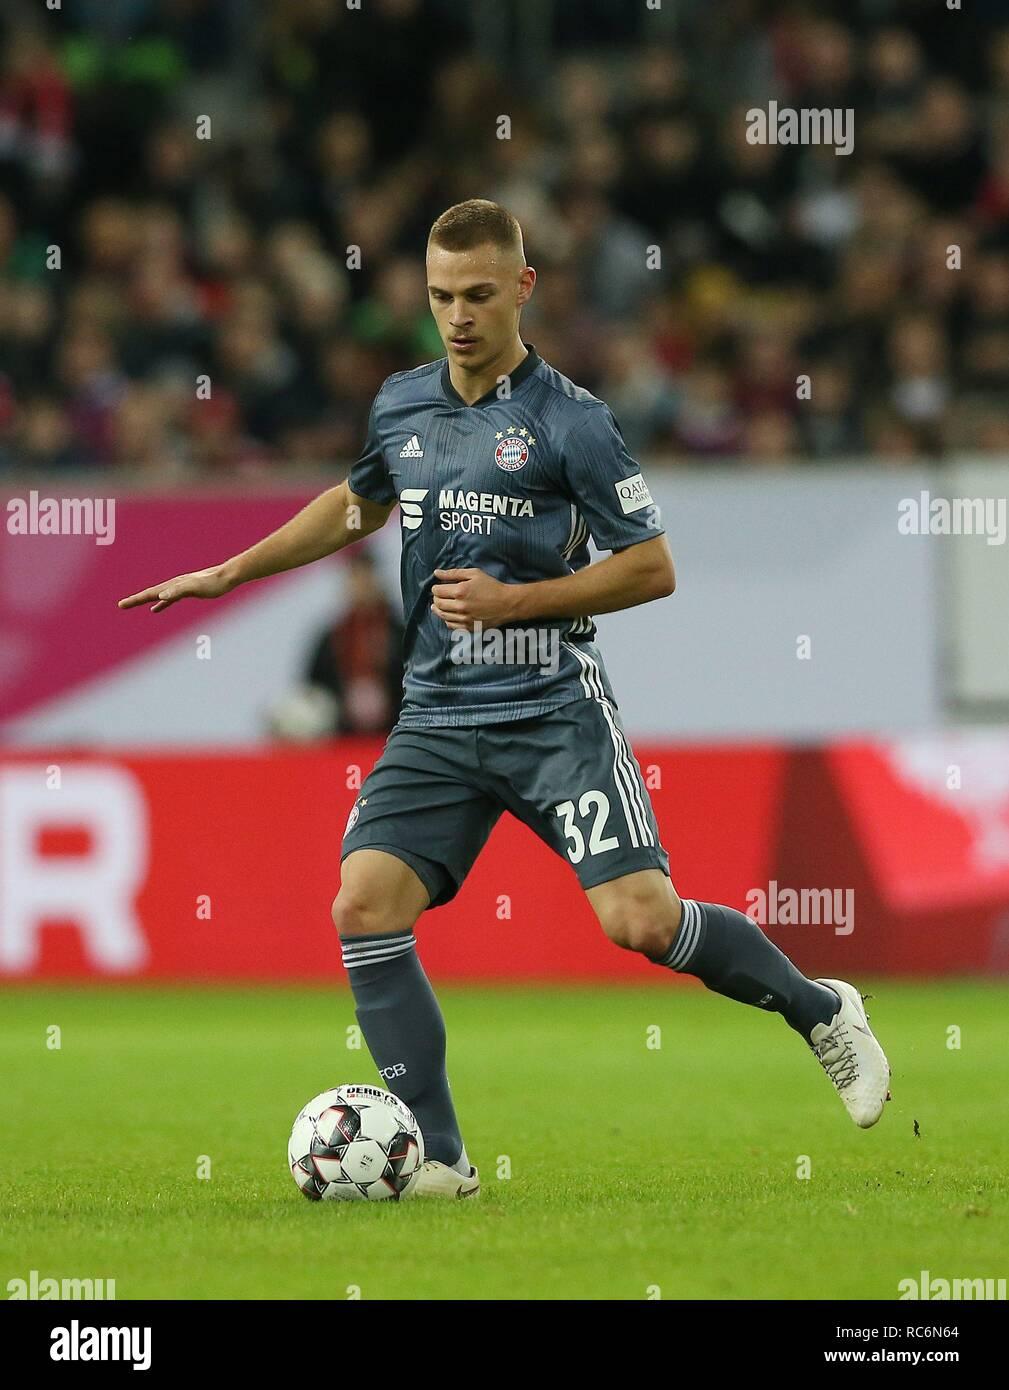 firo: 13.01.2019, football, 1.Bundesliga, season 2018/2019, Telekom-Cup 2019, FC Bayern Munich, Joshua KIMMICH, single action   usage worldwide - Stock Image